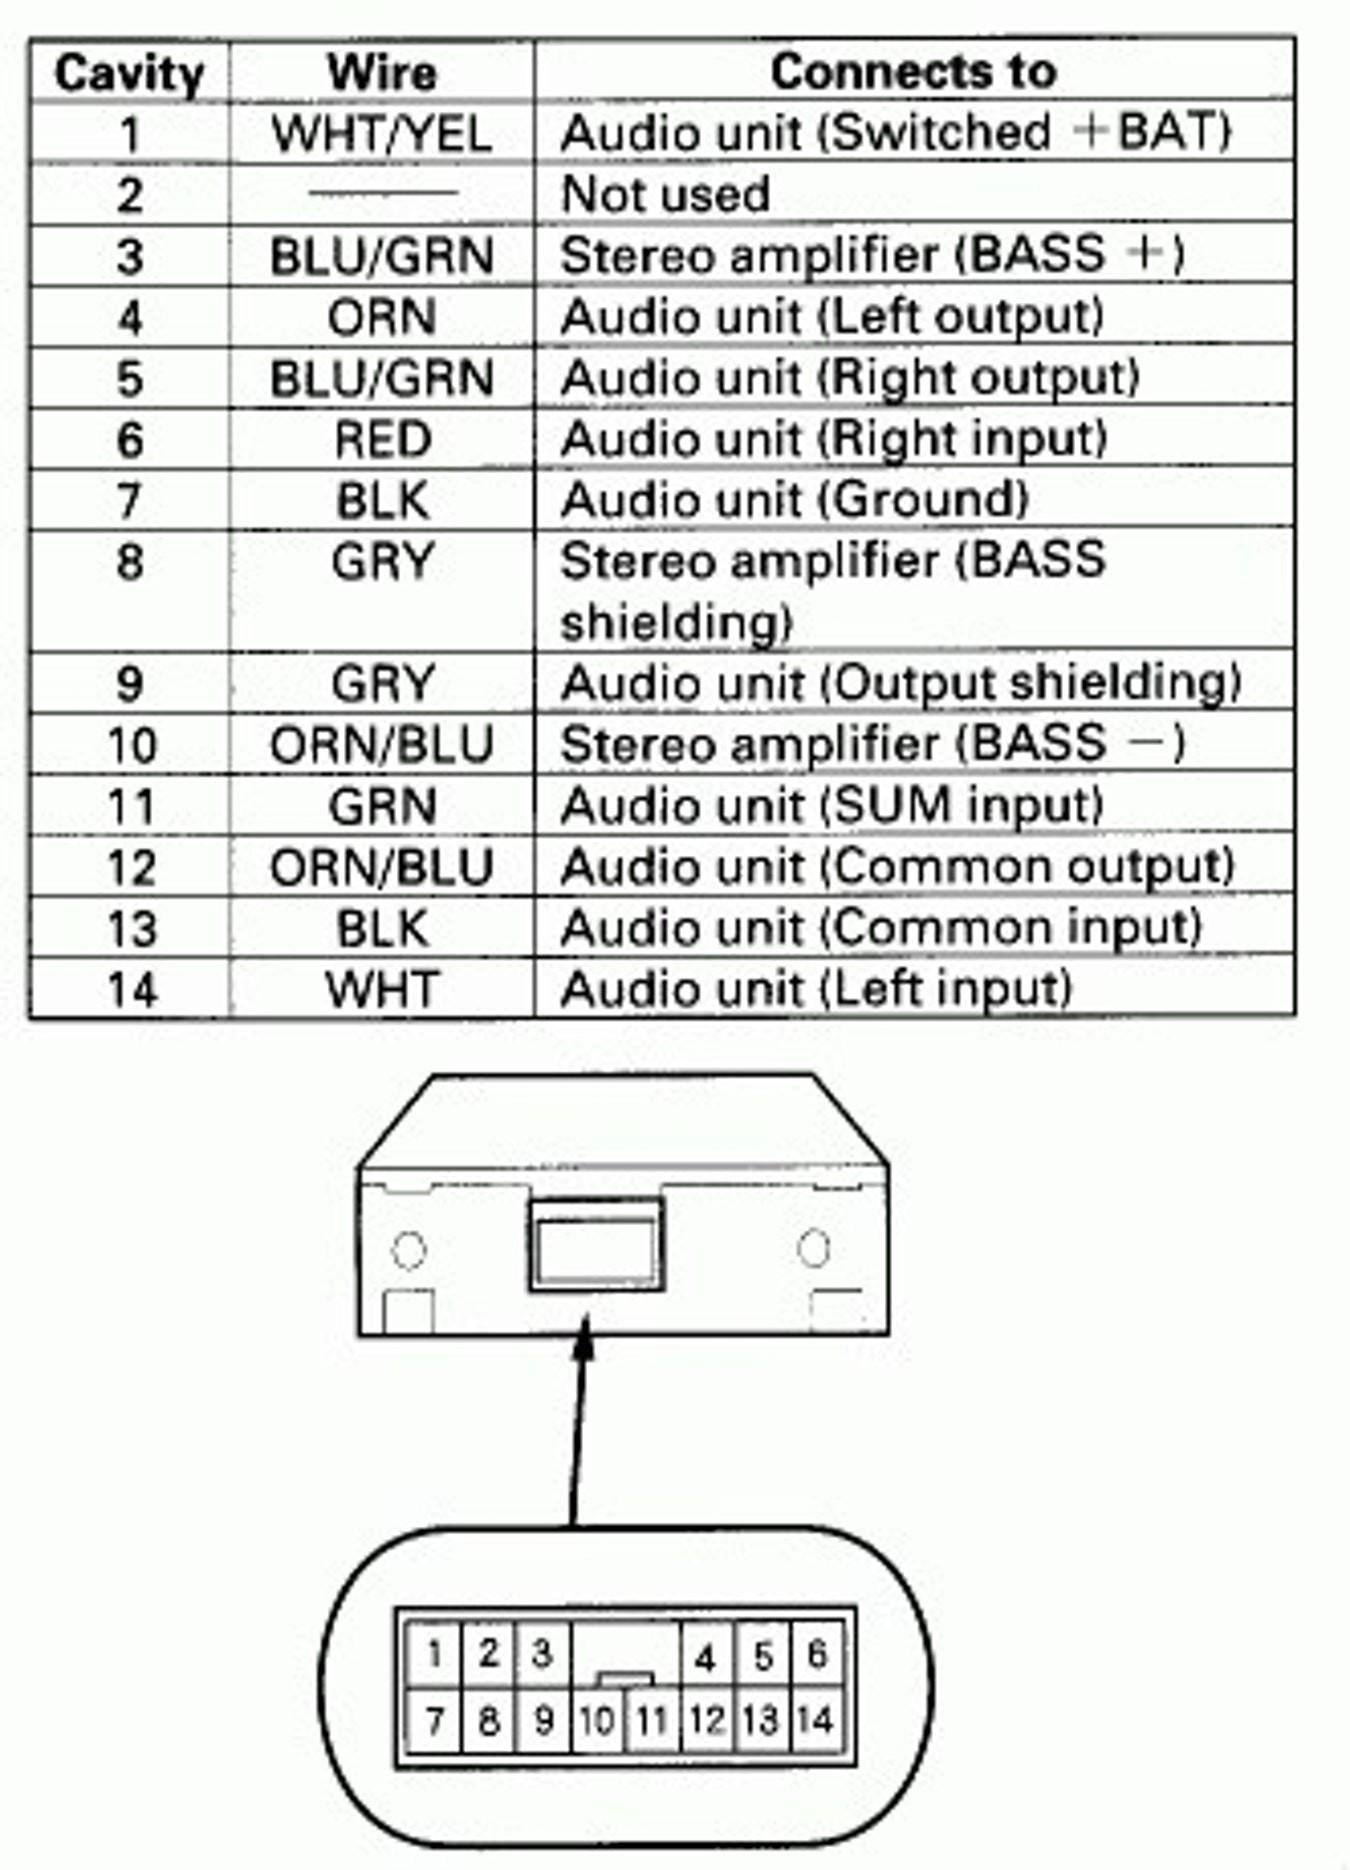 kenwood sub amp wiring harness colors lo 0895  honda car stereo wiring diagram kenwood car stereo wiring  honda car stereo wiring diagram kenwood